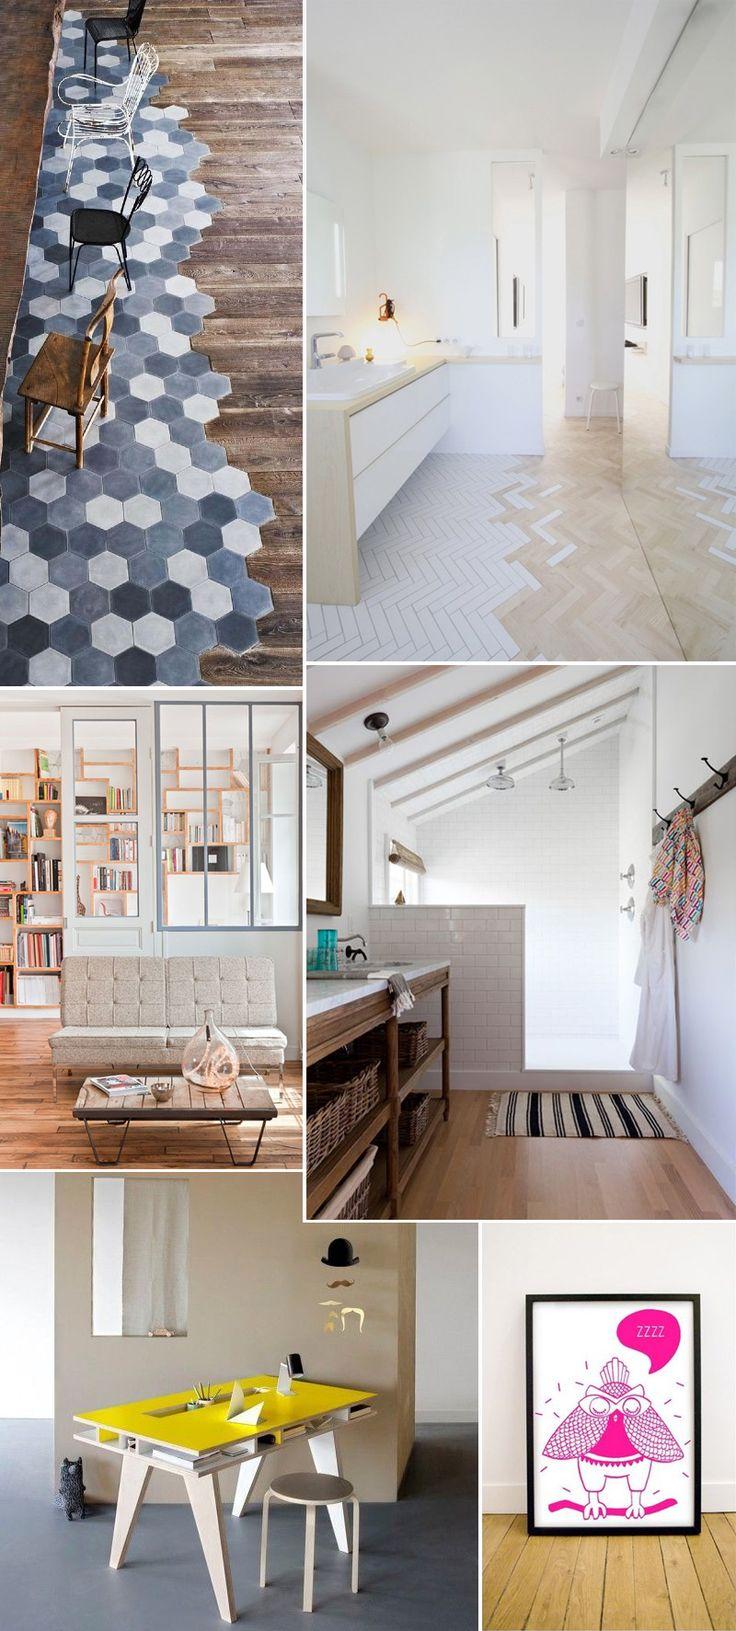 12 best Bathroom Renovations images on Pinterest | Bathroom ...